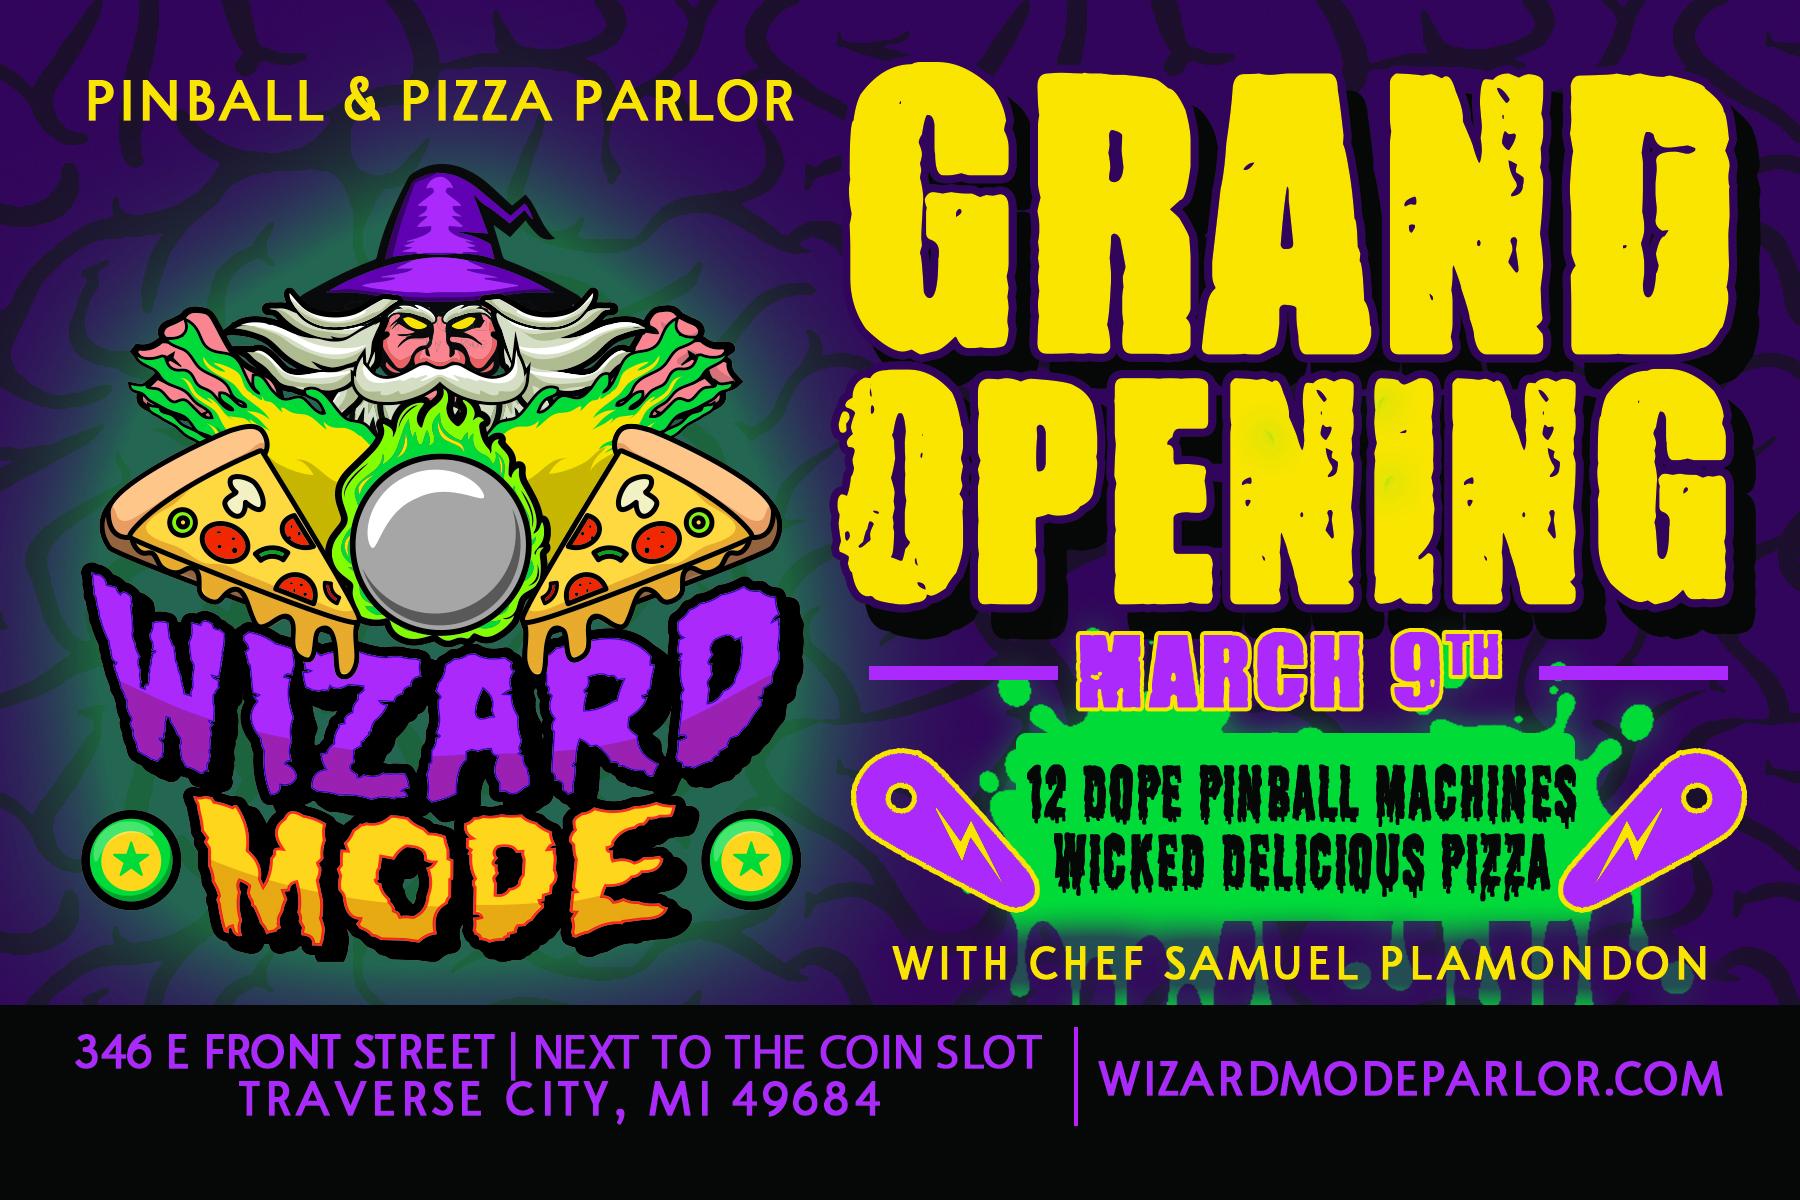 WizardMode_GrandOpeningPromo_4%22x6%22.jpg